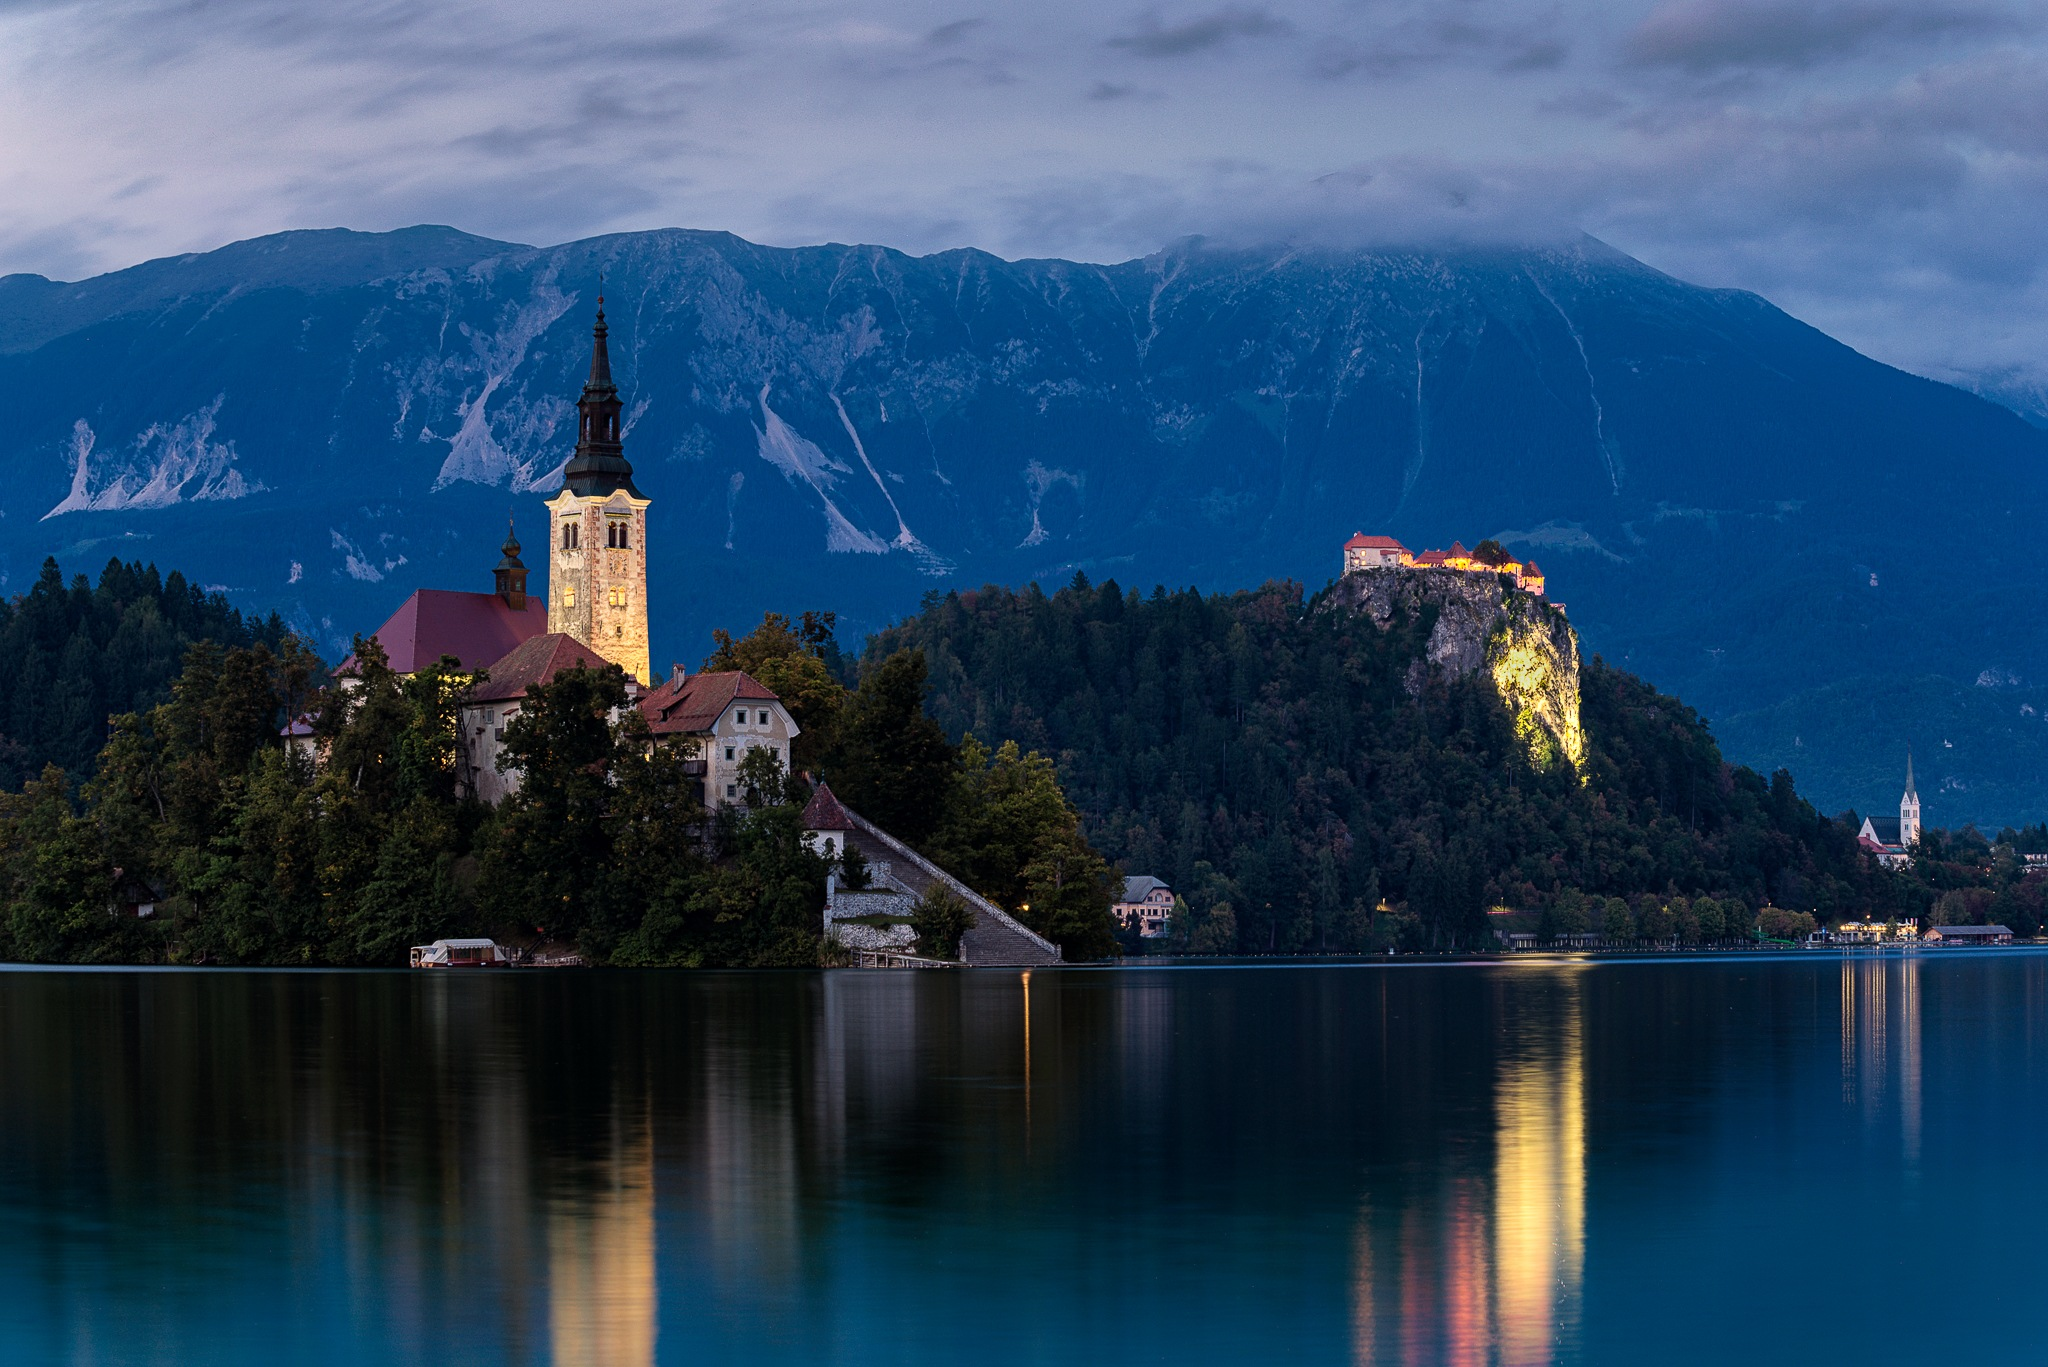 Twilight church by Simo Tynys